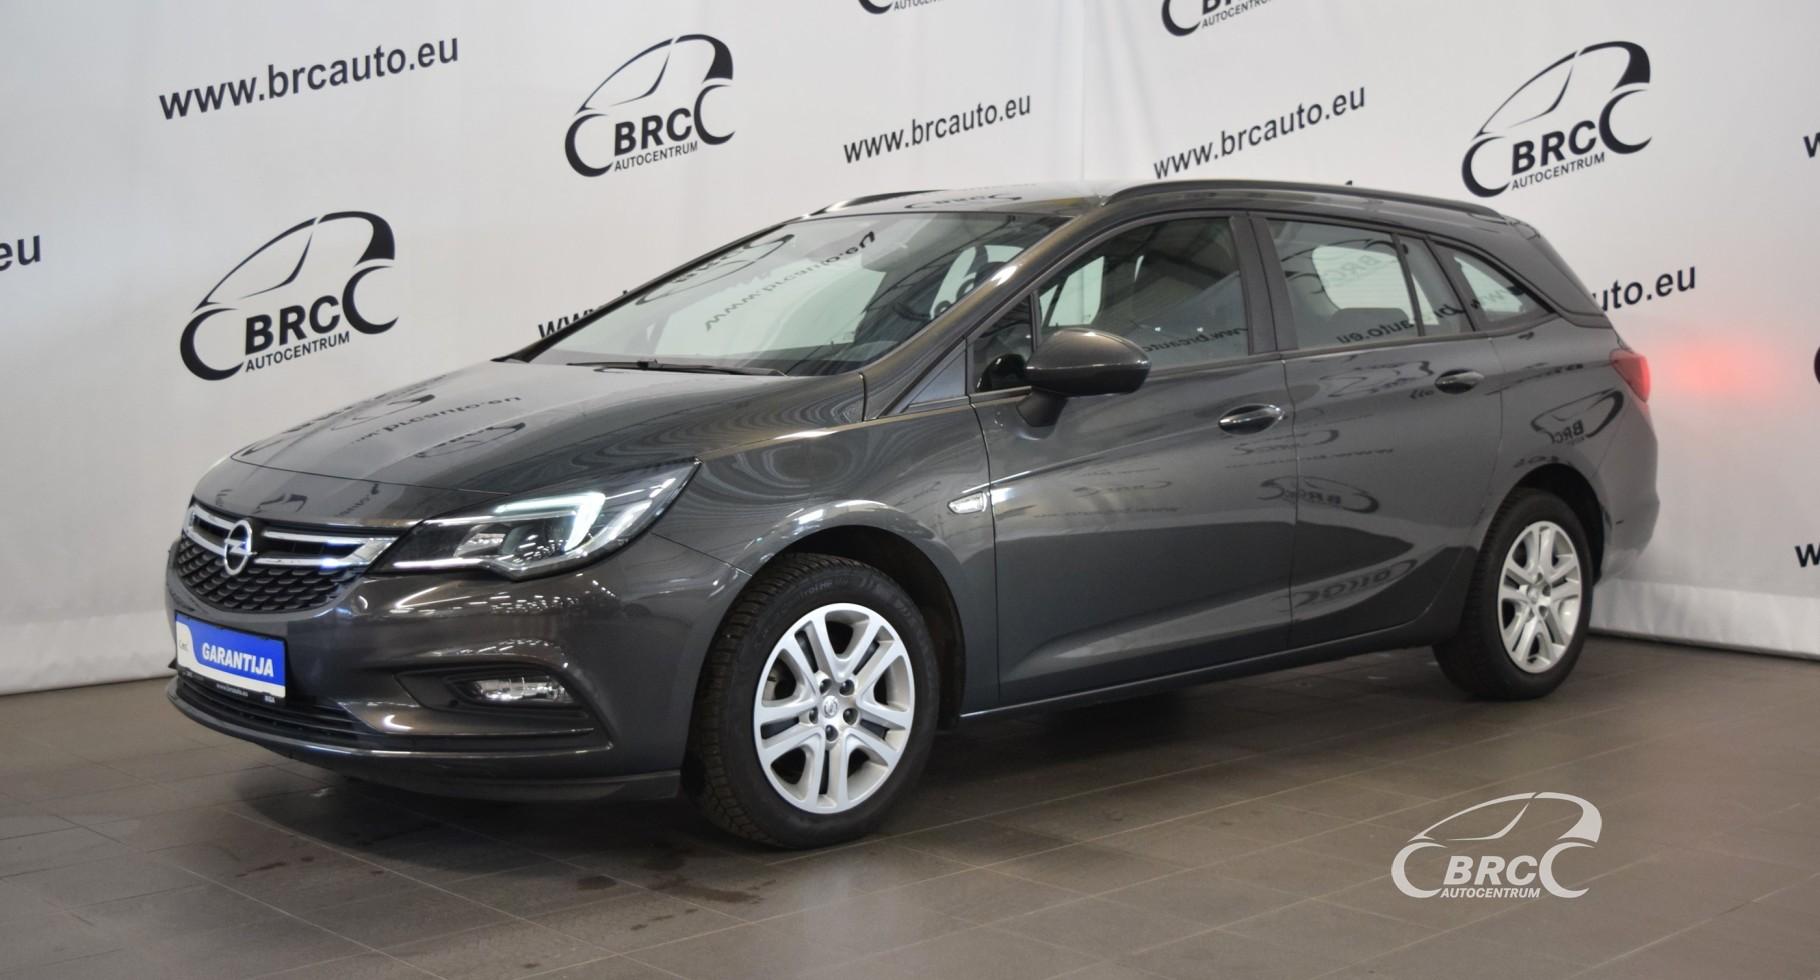 Opel Astra Station Wagon CDTi